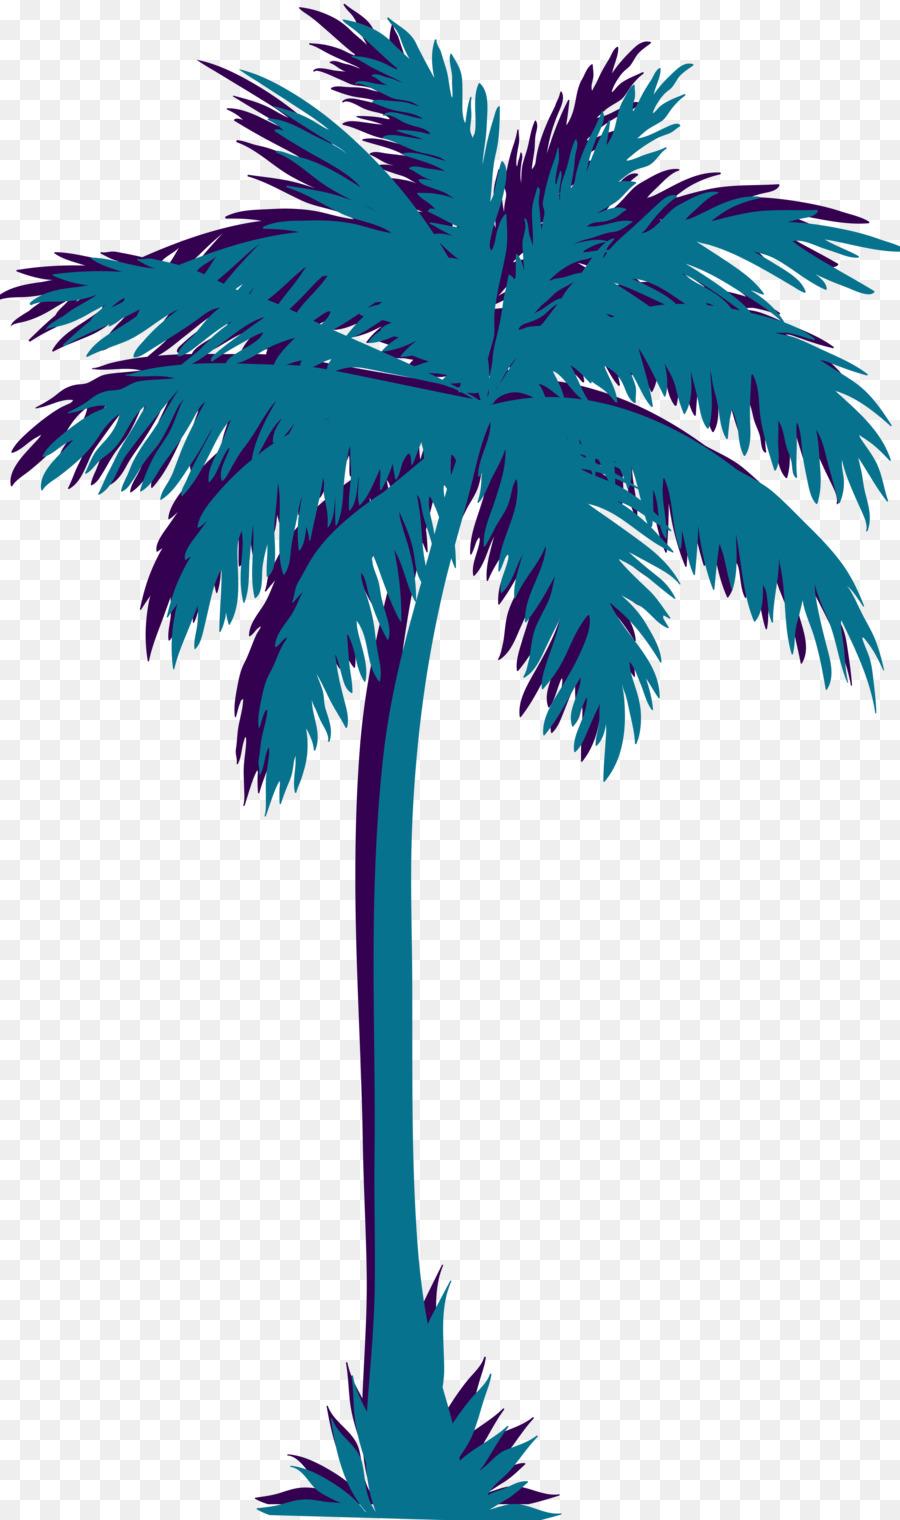 The Best Vaporwave Palm Tree Transparent Background Gif